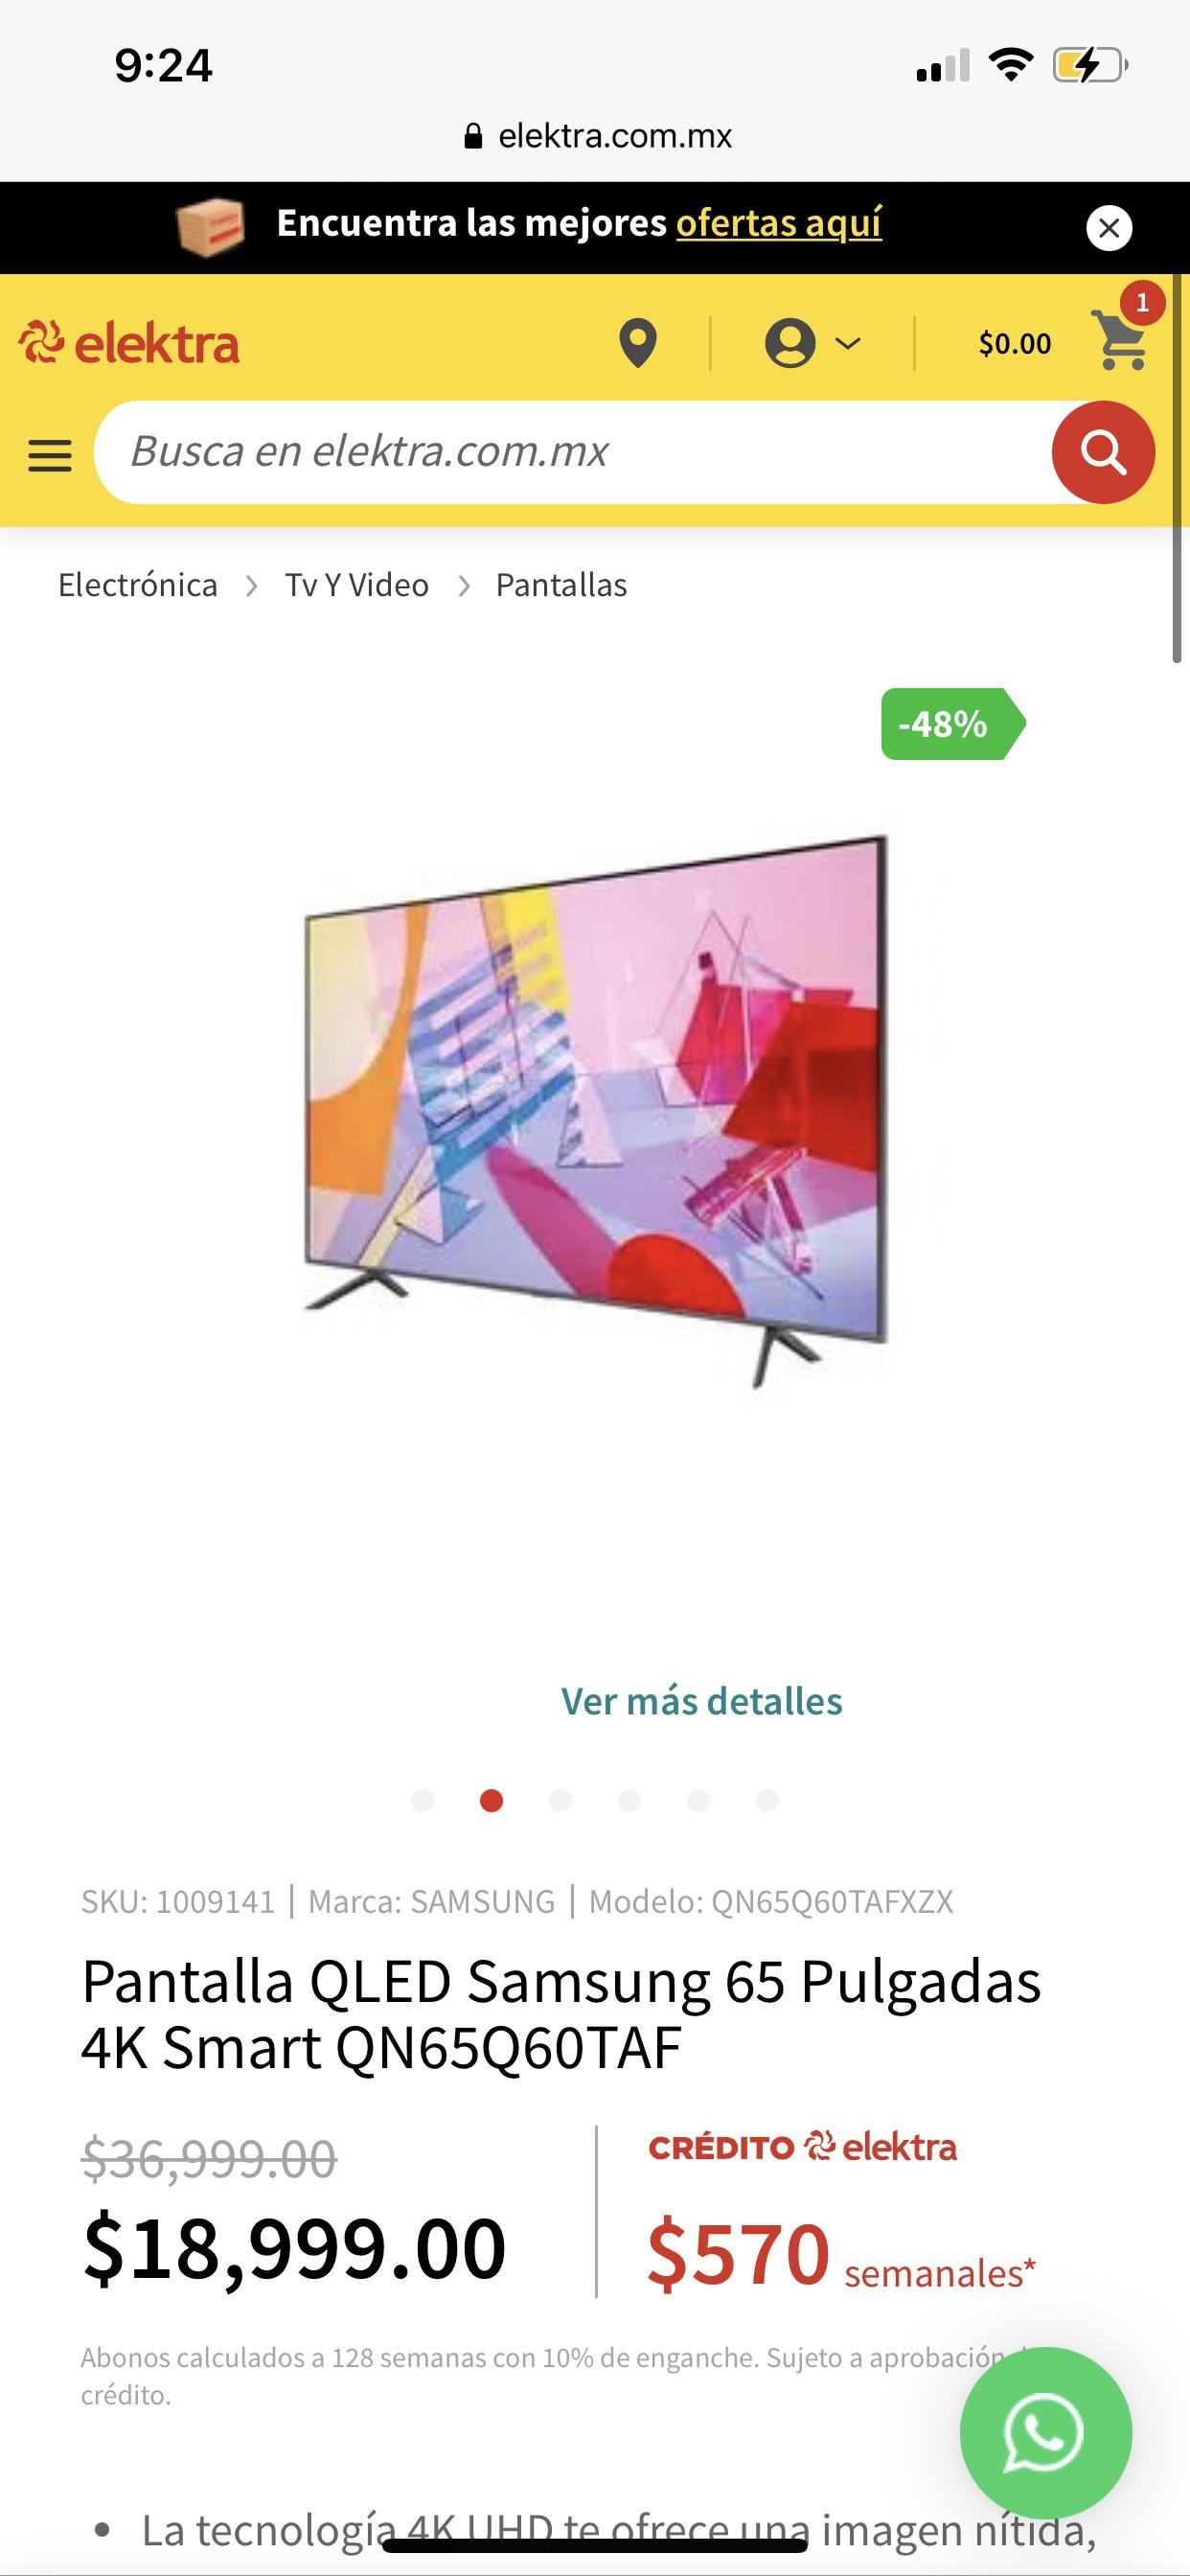 Elektra: Pantalla QLED Samsung 65 Pulgadas 4K Smart QN65Q60TAF